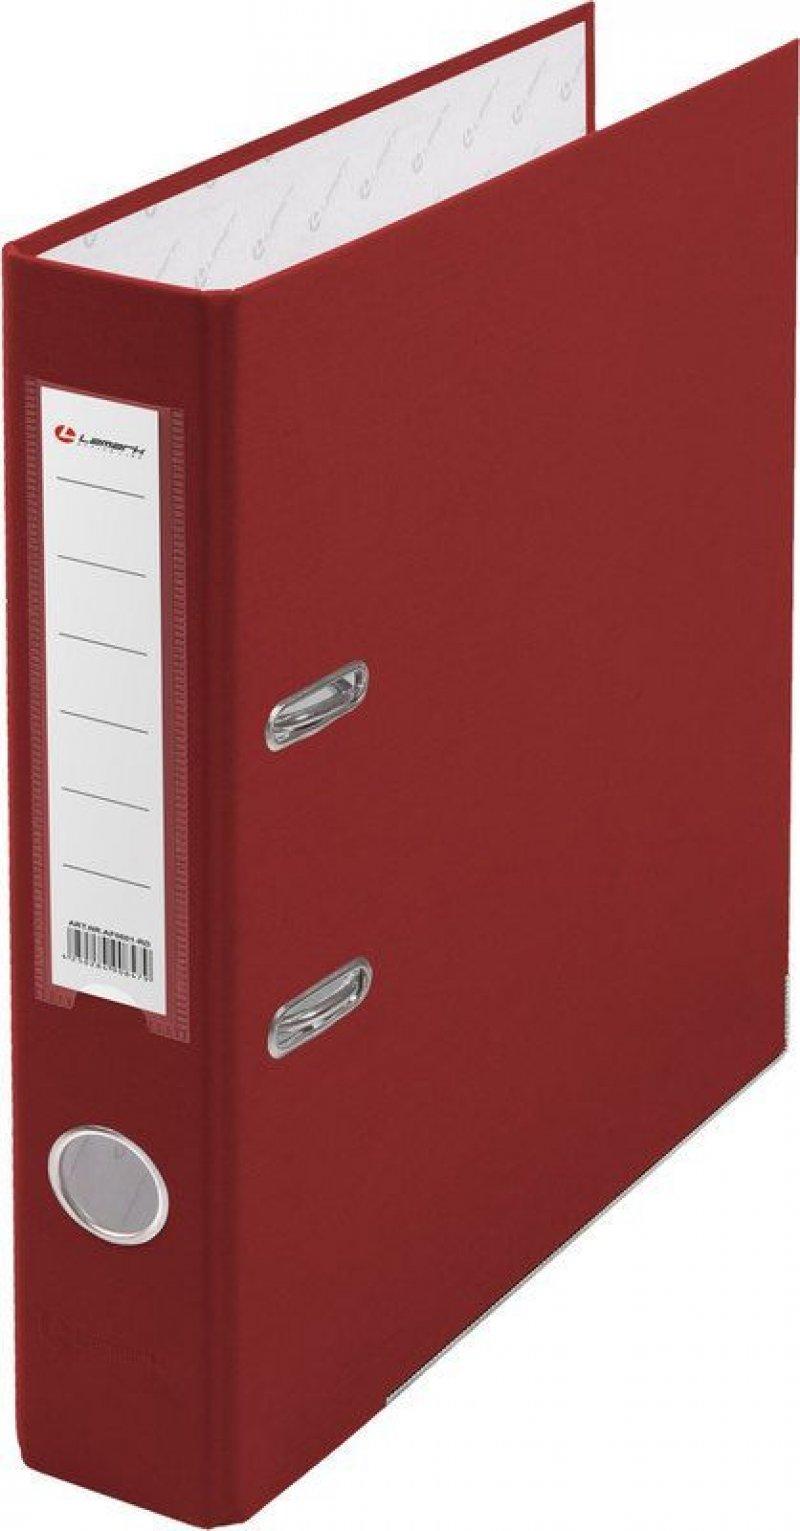 Папка-регистратор 50мм Lamark бумвинил карман красный металл